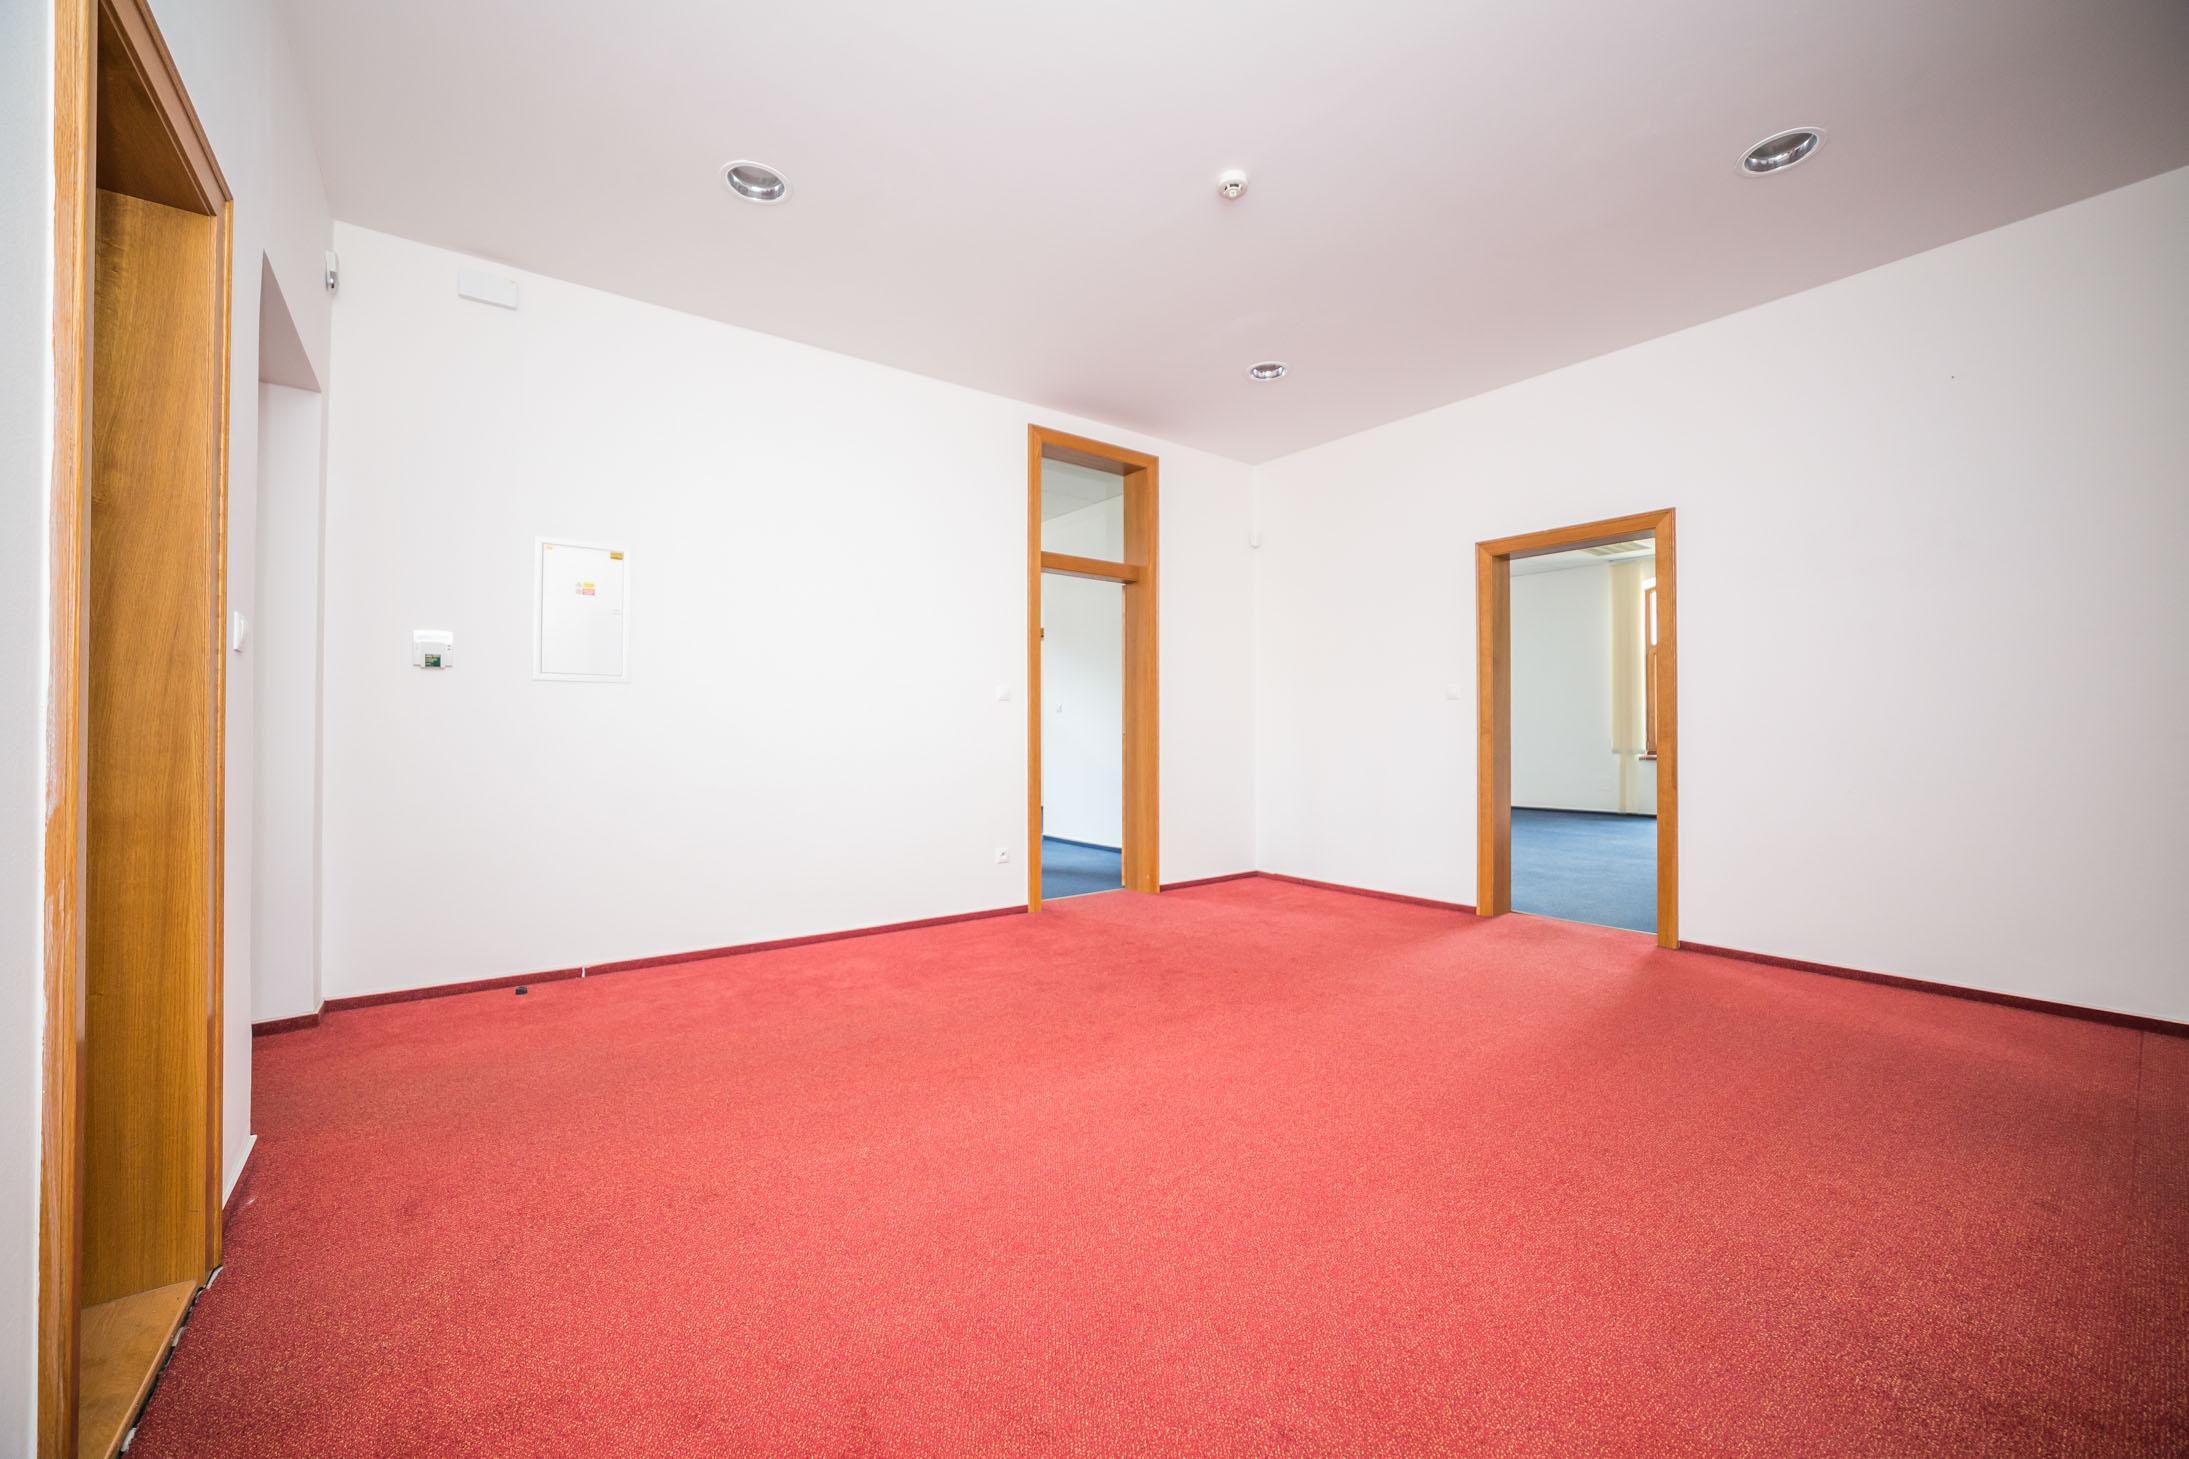 opava reality koberec dvere svetlo jistice telefon podhled zaruben